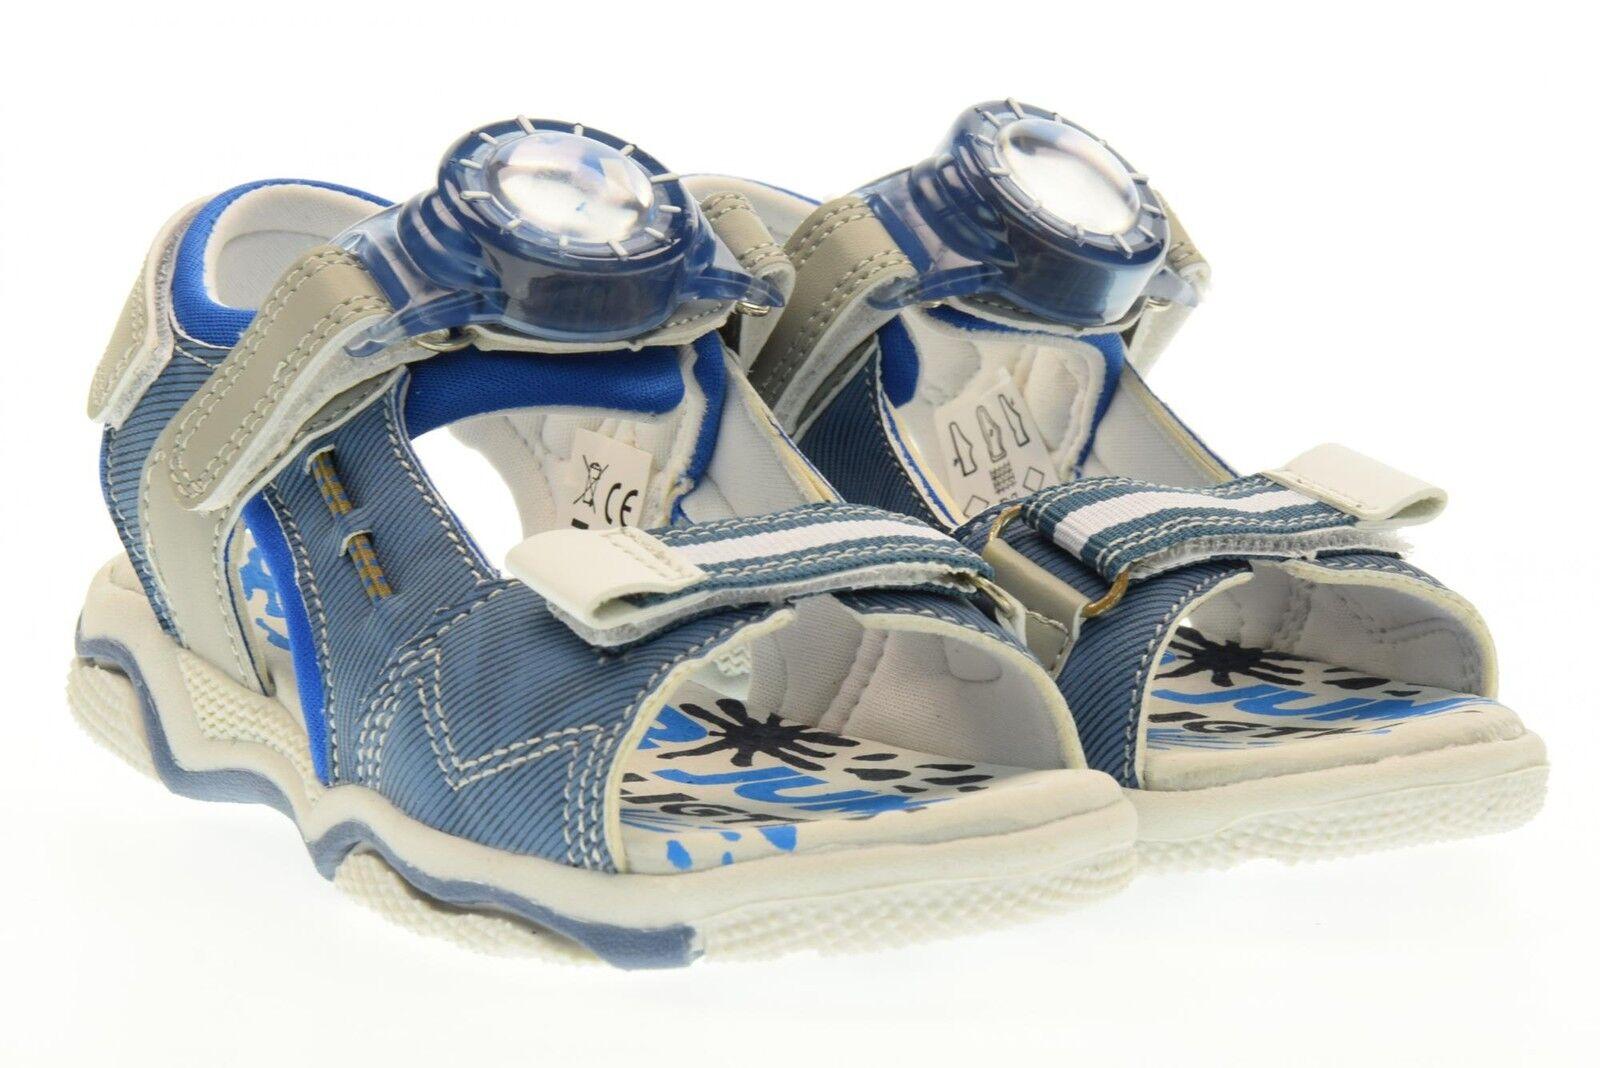 SuperJump Collezione America chaussures bambino sandali SJ2974 VICTOR bleu JEANS P17